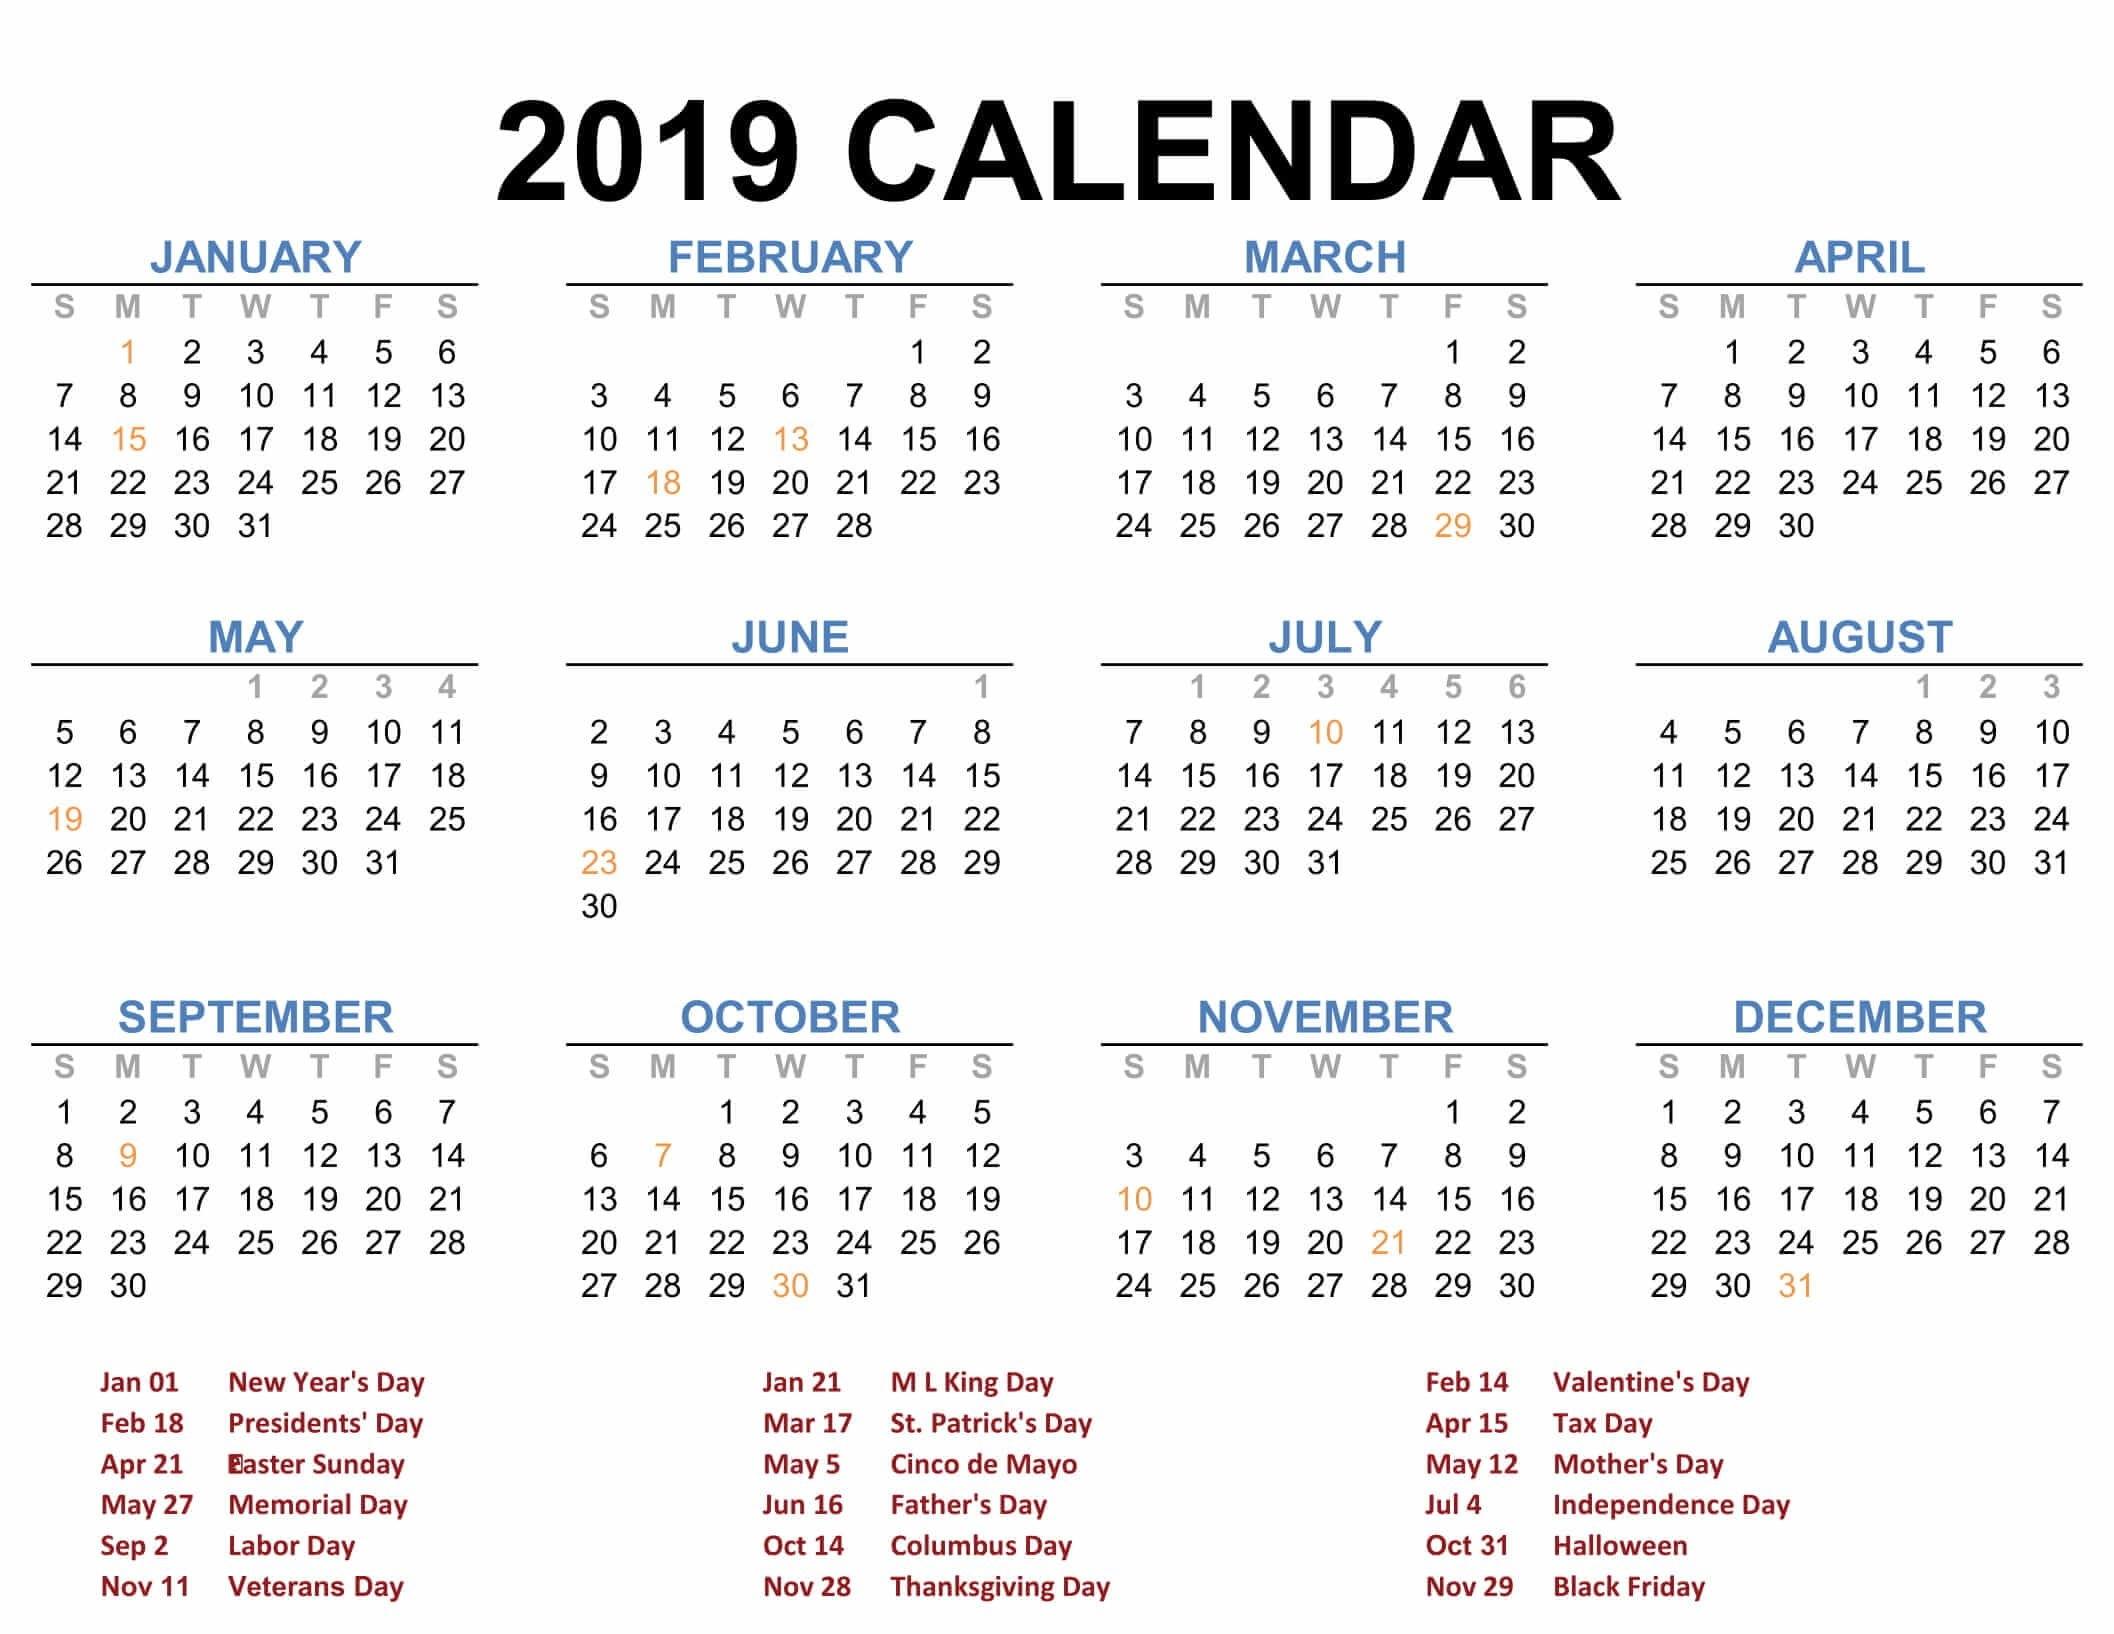 Printable Blank 2019 Calendar Templates - Calenndar Images Of A 2019 Calendar